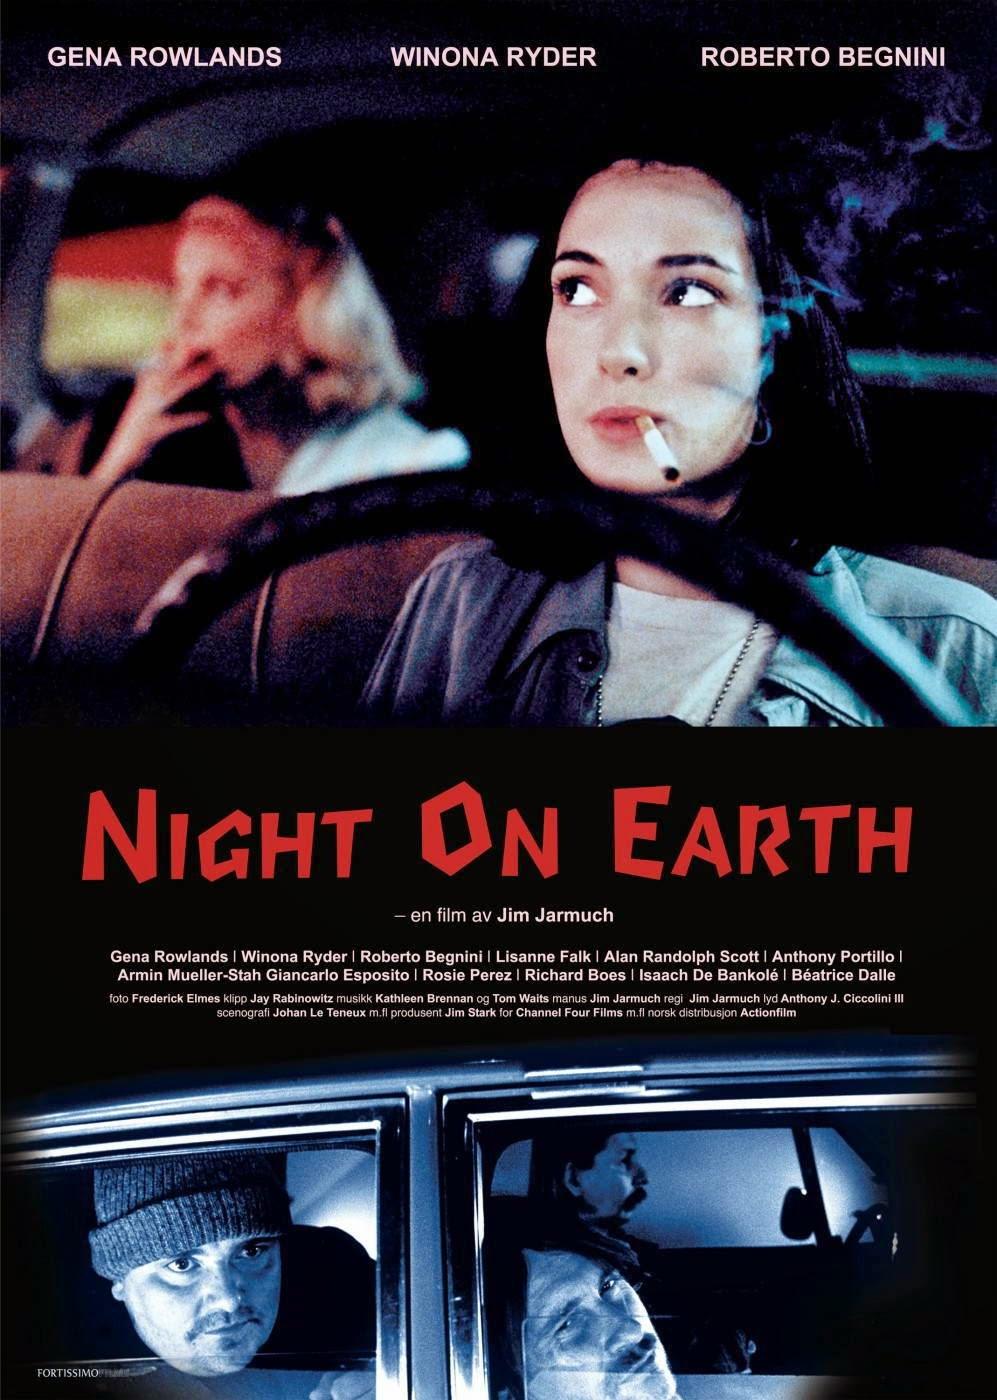 cartel Night on Earth 1991 Jim Jarmusch